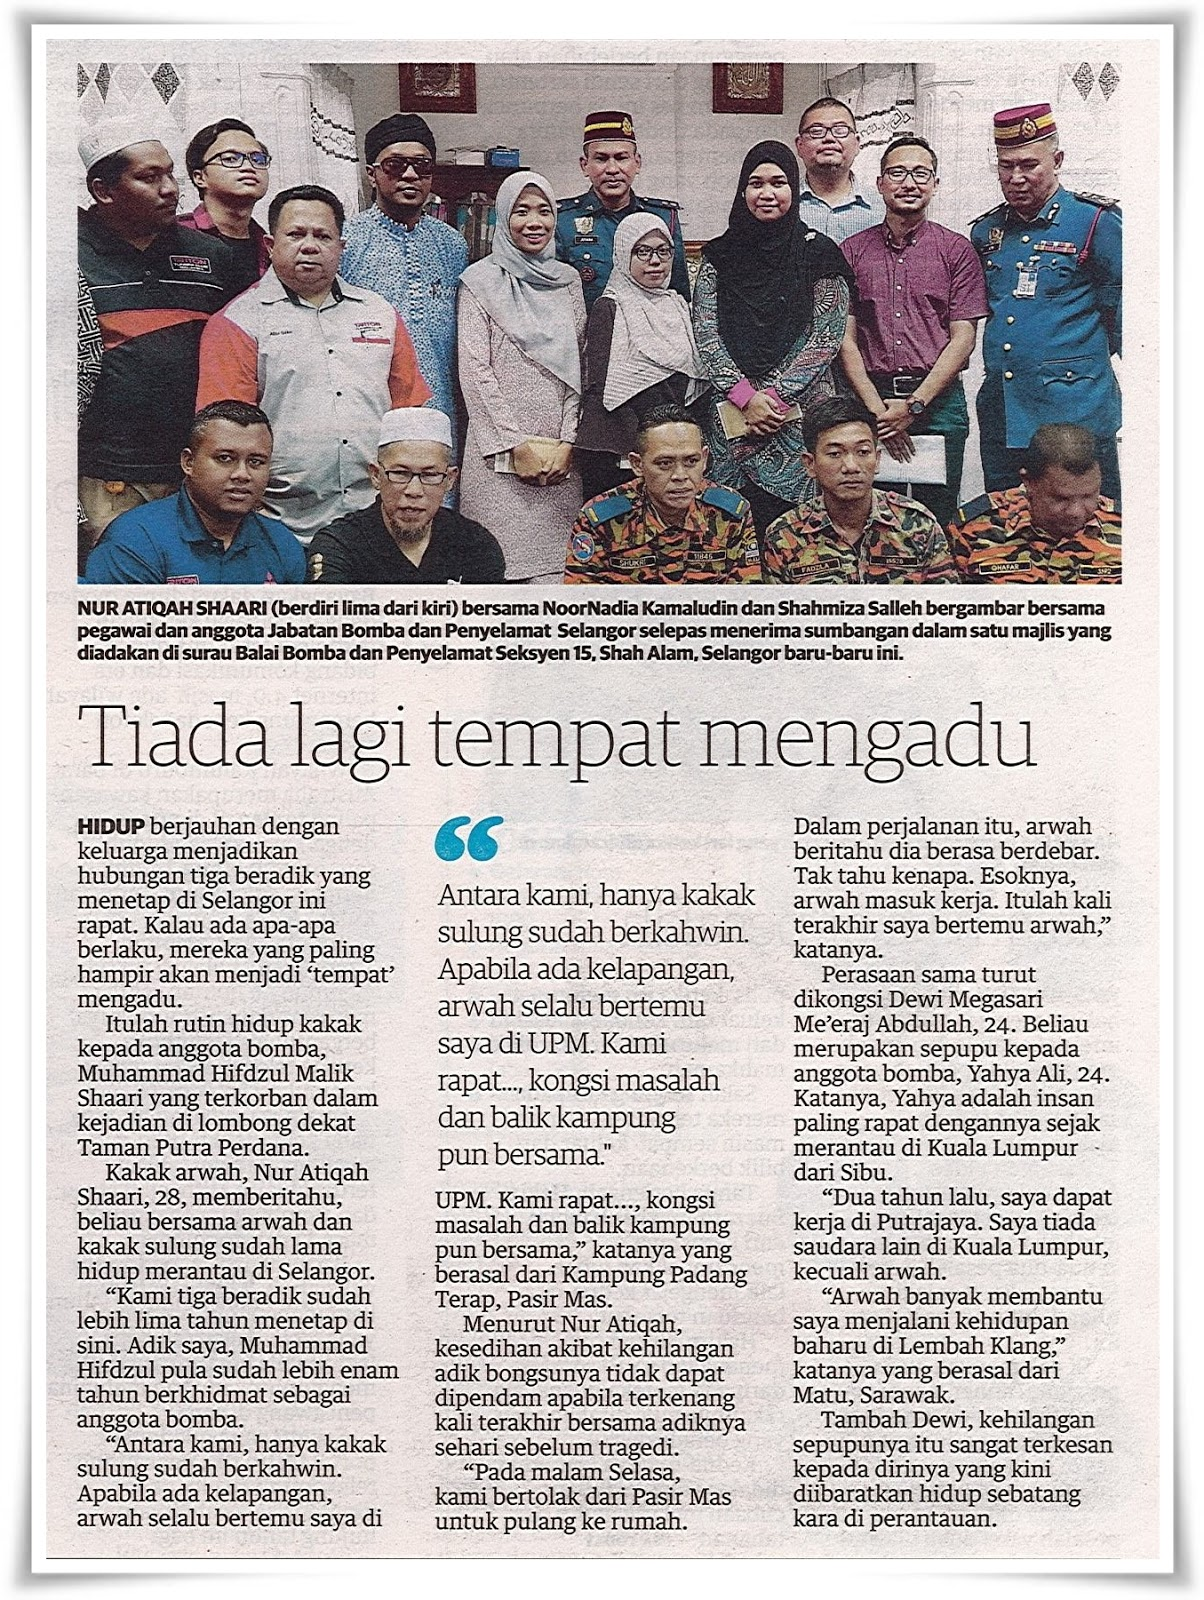 Rencana ; Reda pemergian suami - Keratan akhbar Utusan Malaysia 3 November 2018